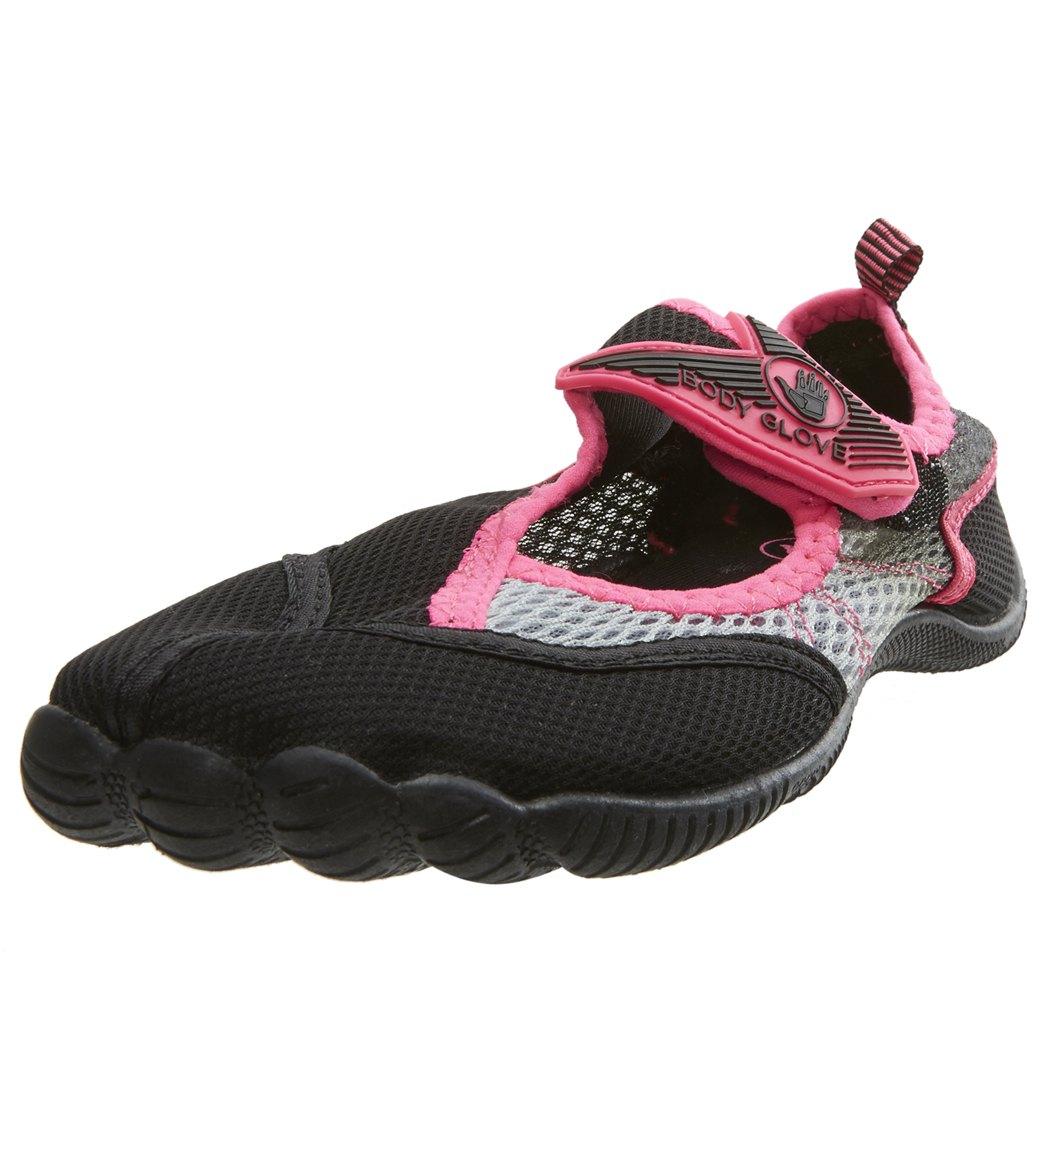 4a3b65cc Body Glove Girls' Horizon Water Shoes (Little Kid) at SwimOutlet.com